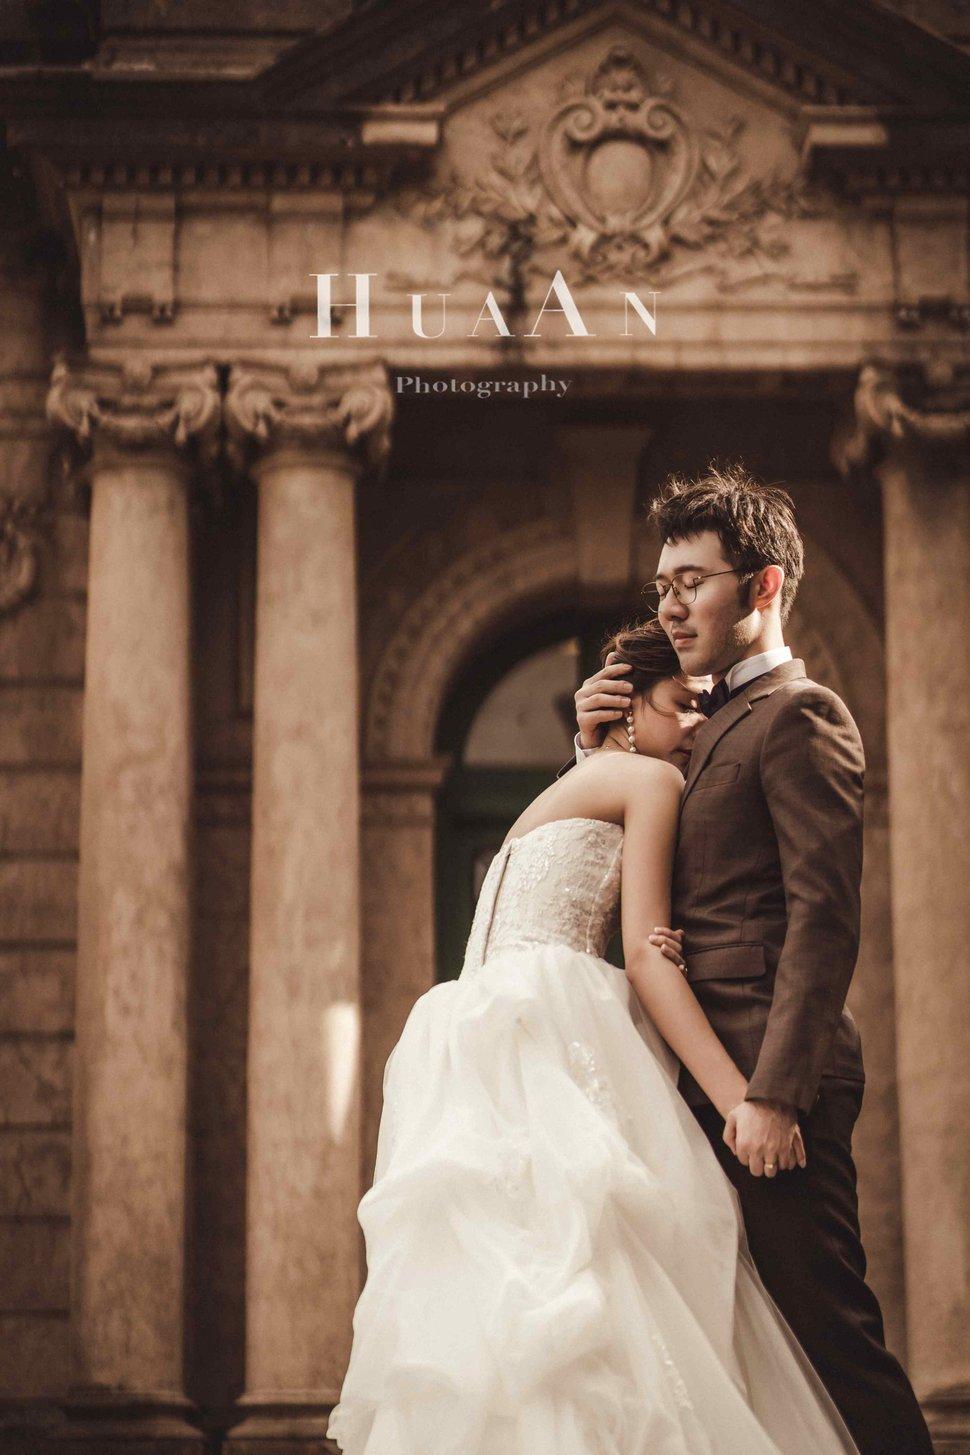 DSC01954 - Huaan Photography《結婚吧》